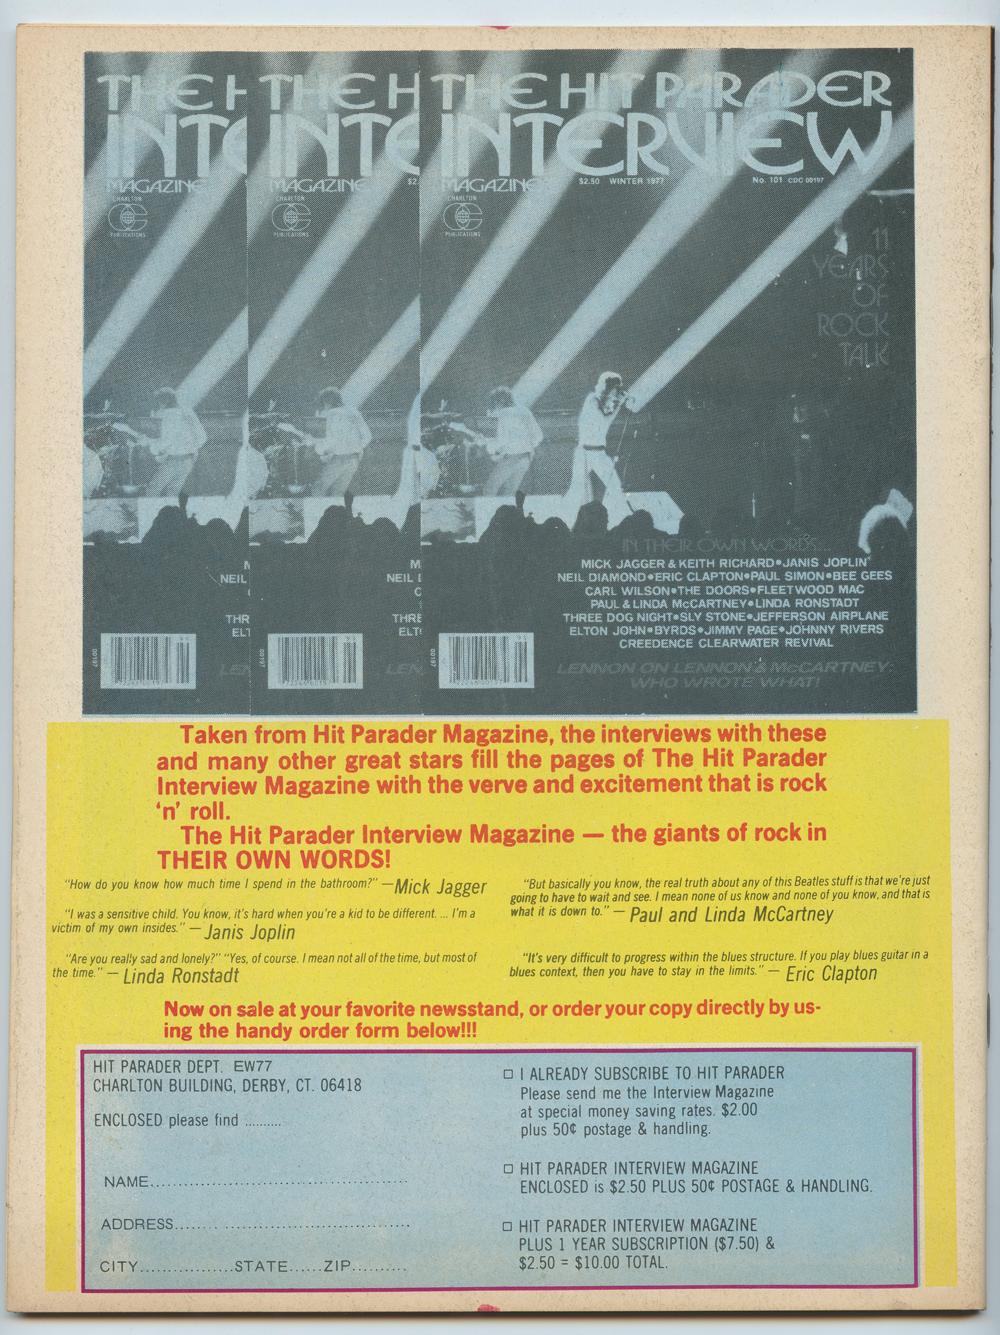 Elvis Presley Magazine Back Issue 1977 Song Hits Magazine's Tribute To Elvis